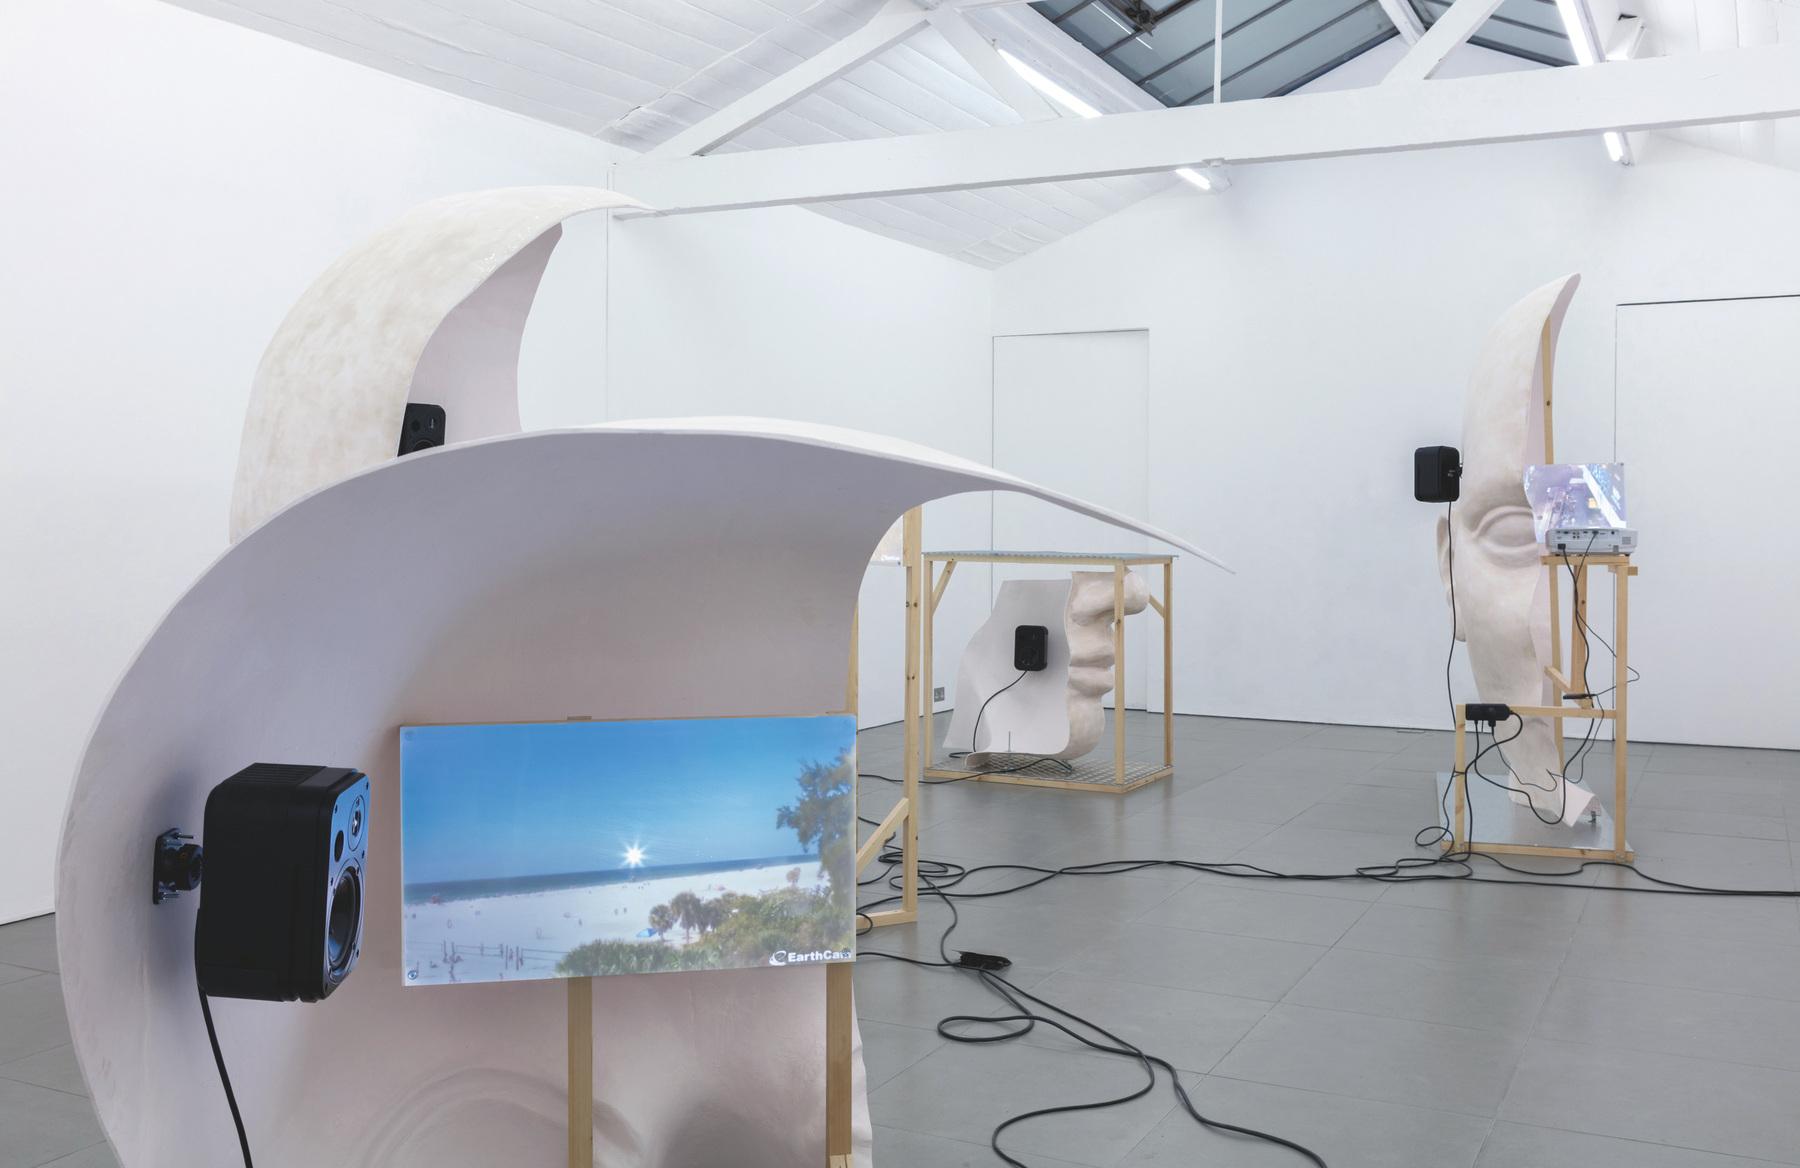 16. Anne de Vries, SUBMISSION 2015, wood, metal, fibreglass resin, audio, video